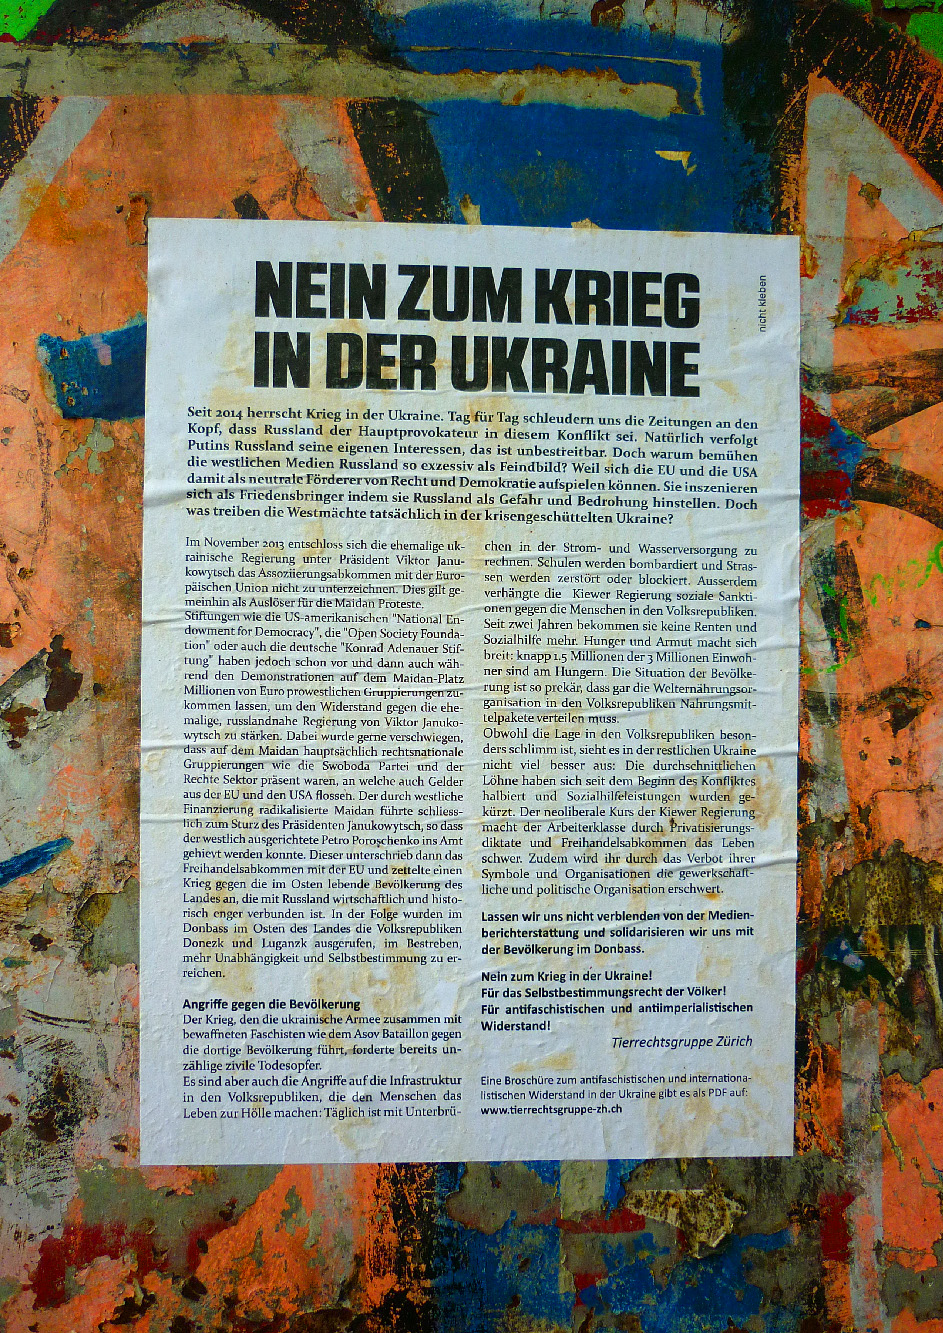 1. Mai Tierrechtsgruppe Zürich 2016 Ukraine Solidarität Odessa Wandzeitung